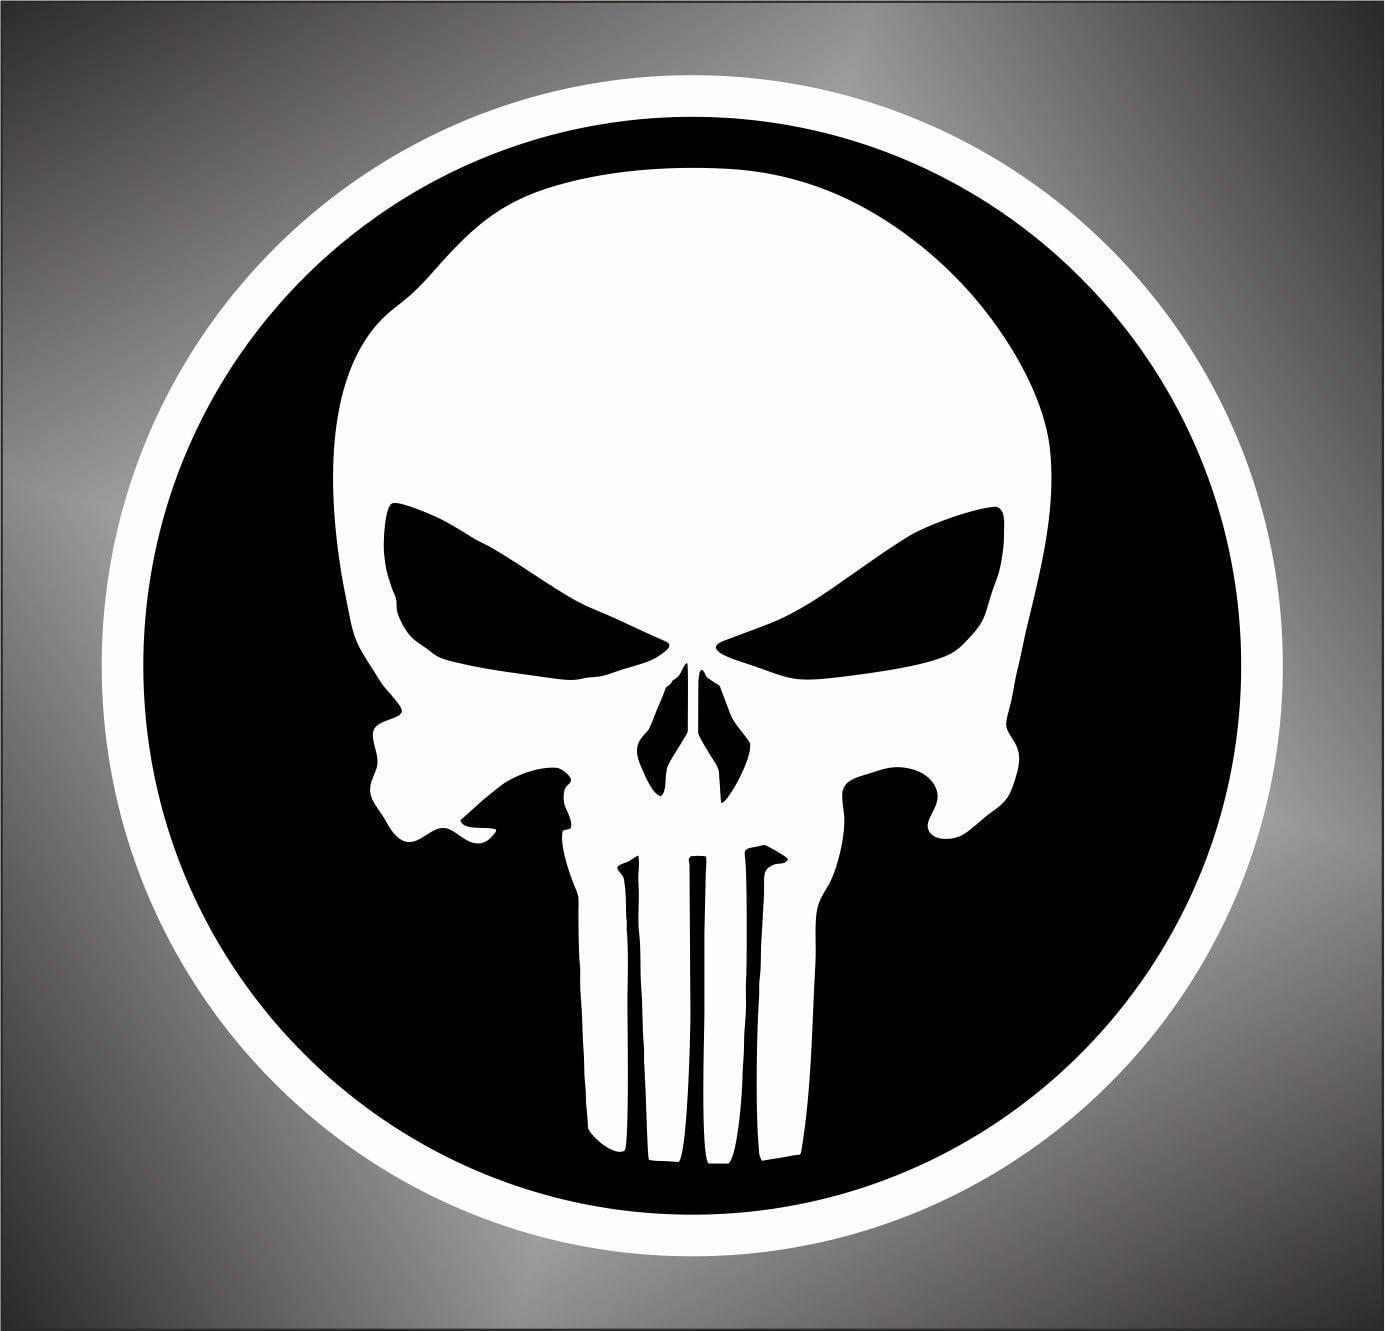 Graphic-lab Stickers Autocollants The Punisher Skull PSP Xbox Autocollants 15 cm